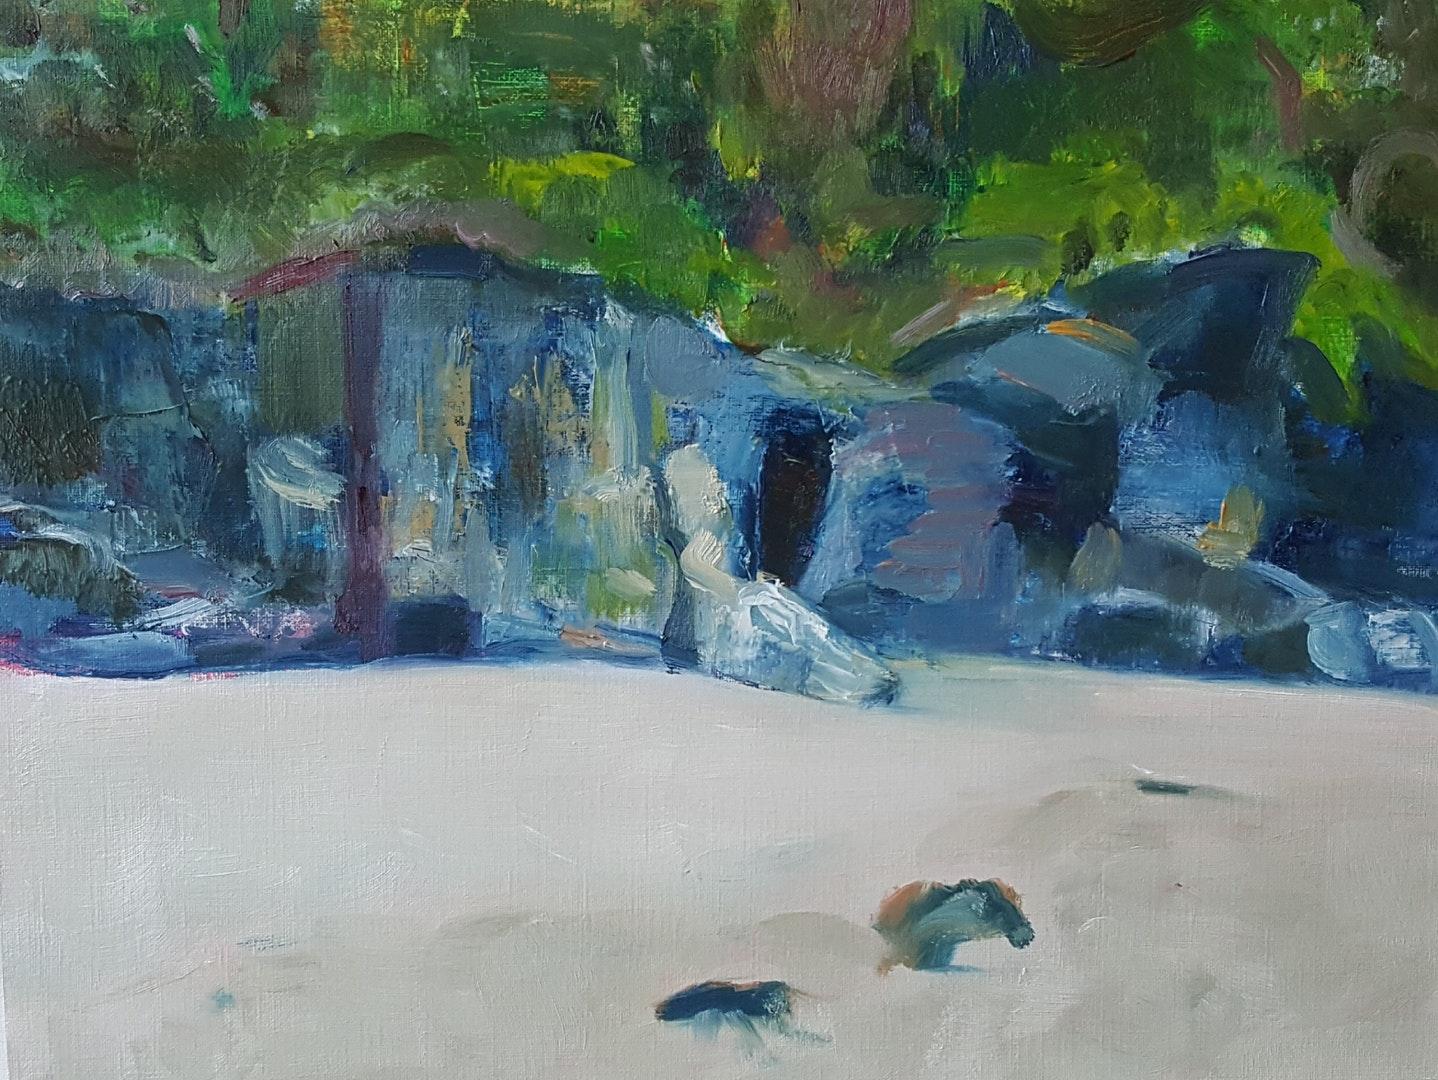 'Beach at Carbis Bay', Margo Random, Oil on paper, 30 x 39 cm